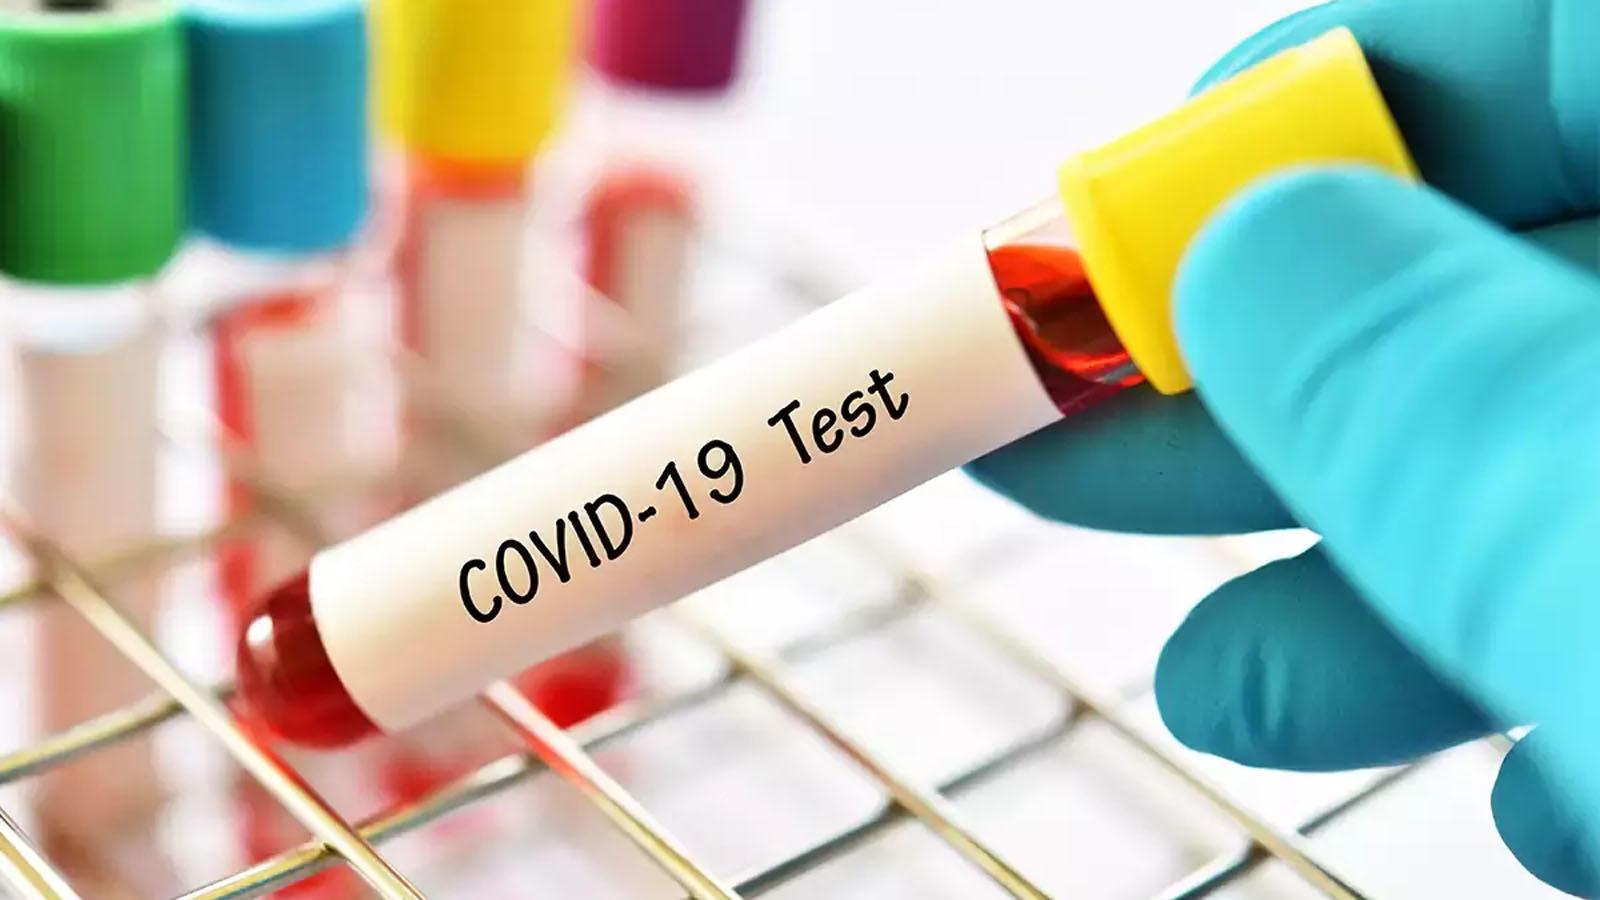 covid-19-chhattisgarh-punjab-odisha-lead-slowdown-in-new-cases